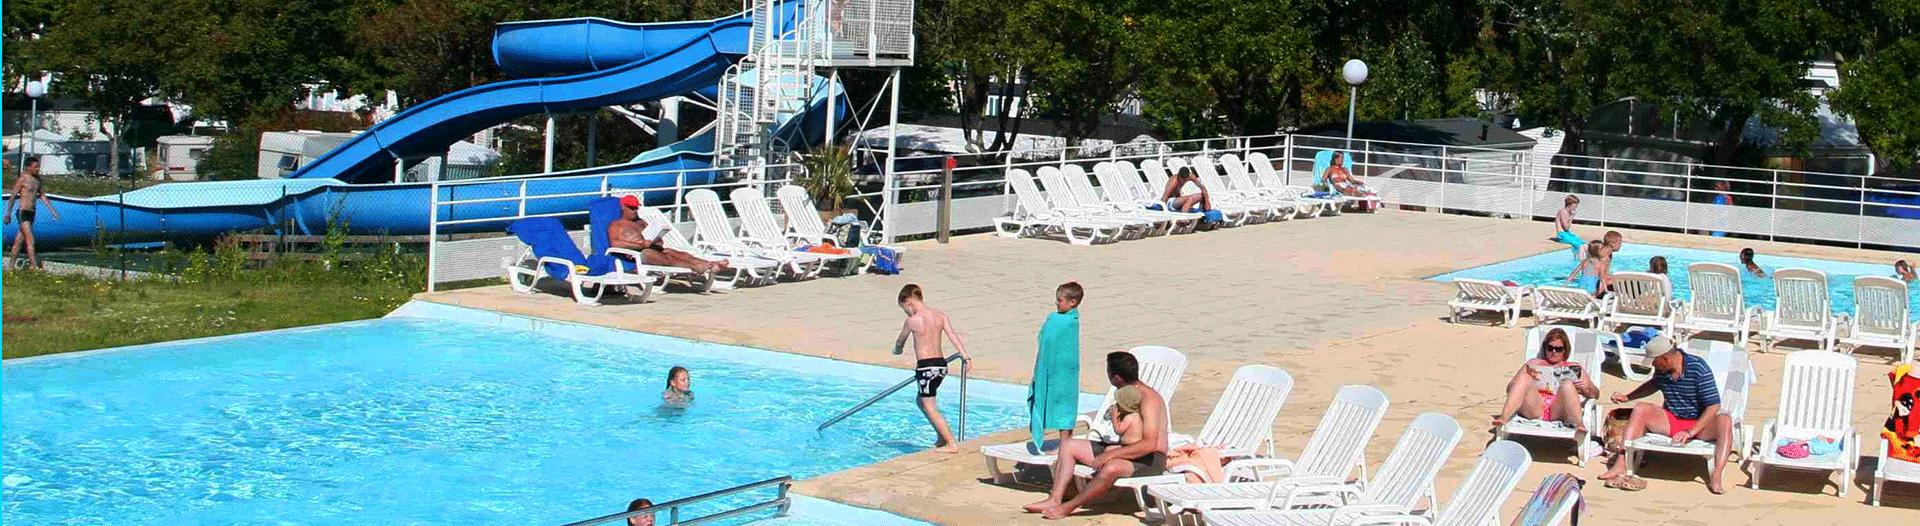 Camping-de-l'Eve-piscine-avec-toboggan-slider